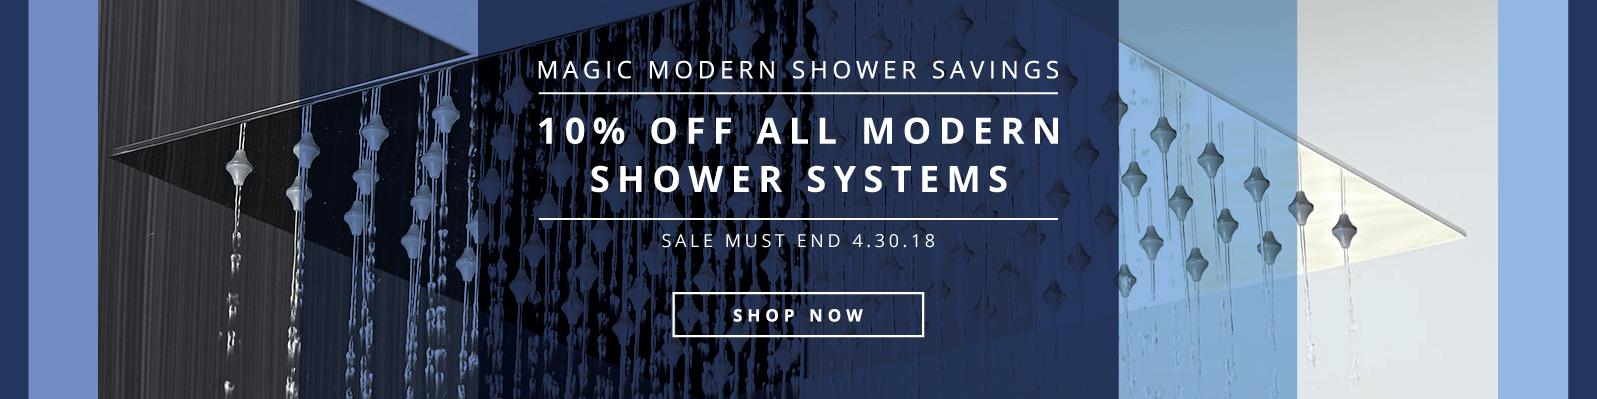 Magic Modern Shower Savings 10% off all modern shower systems Sale Must End 4.30.18